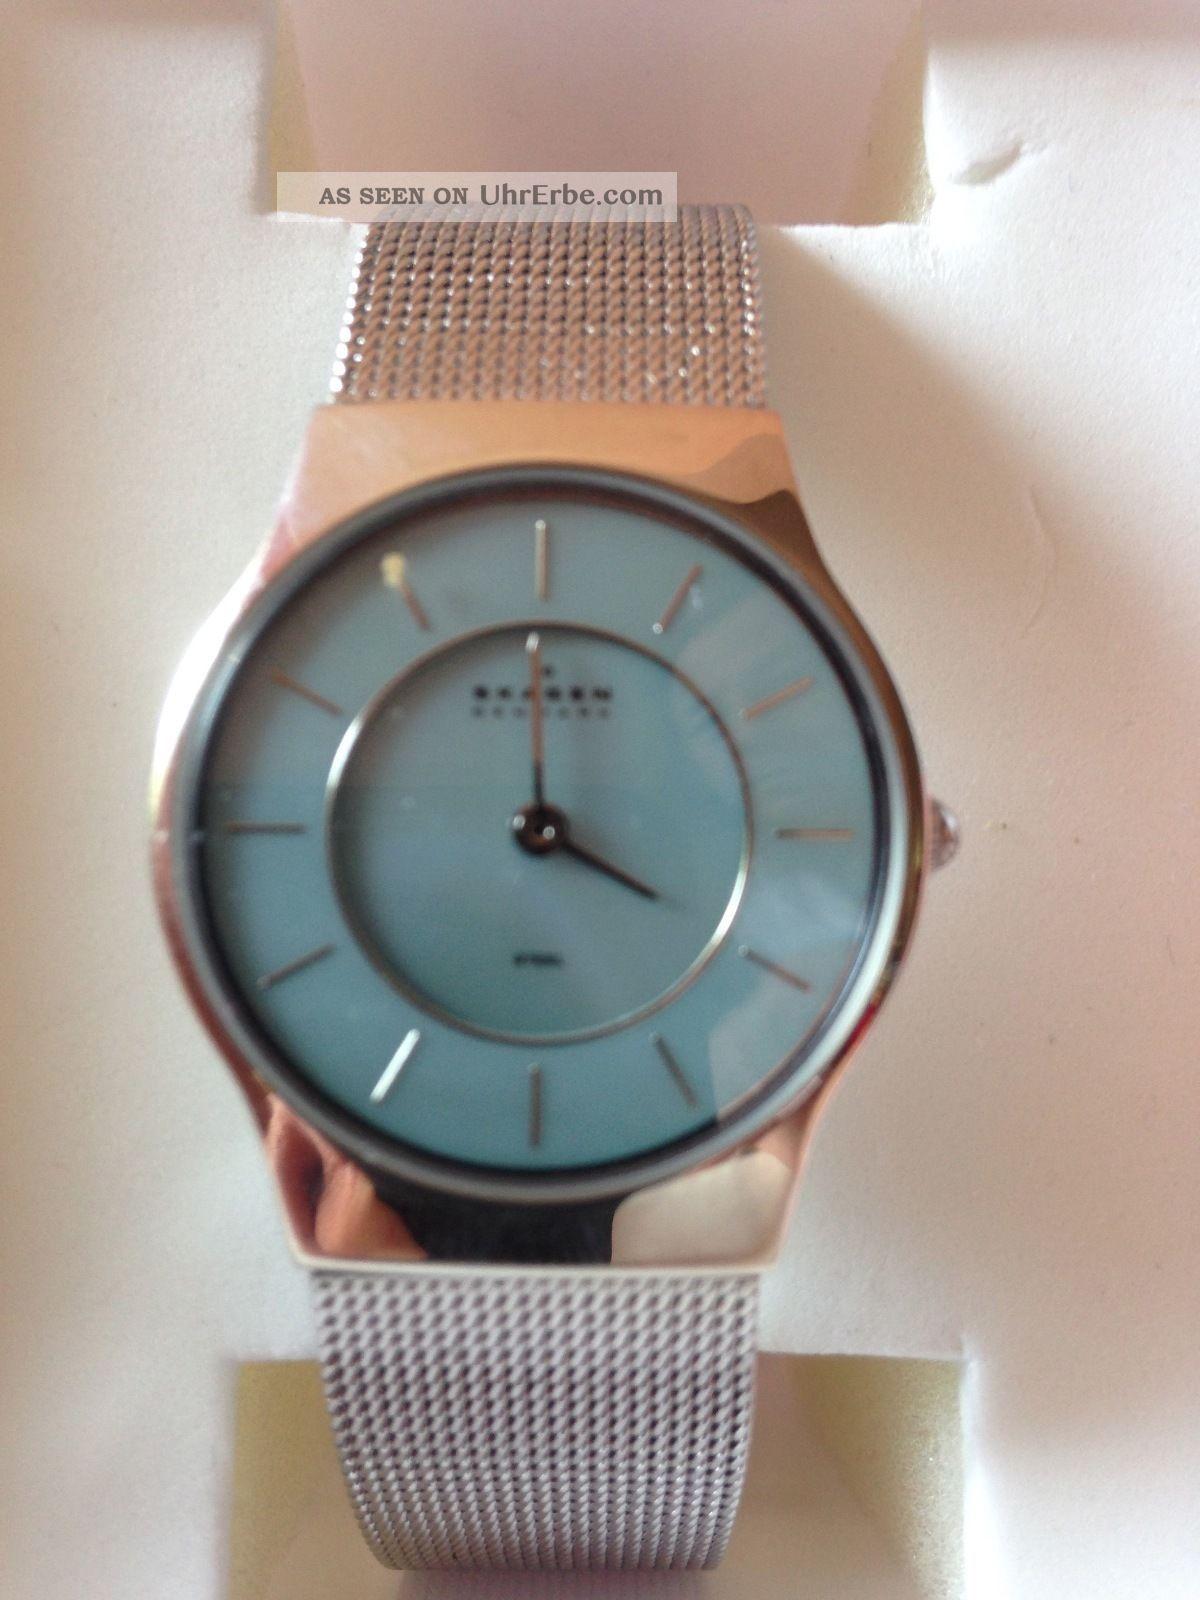 Skagen Uhr Damen Edelstahl Milanaise Armband Flach Edel - Elegant Armbanduhren Bild